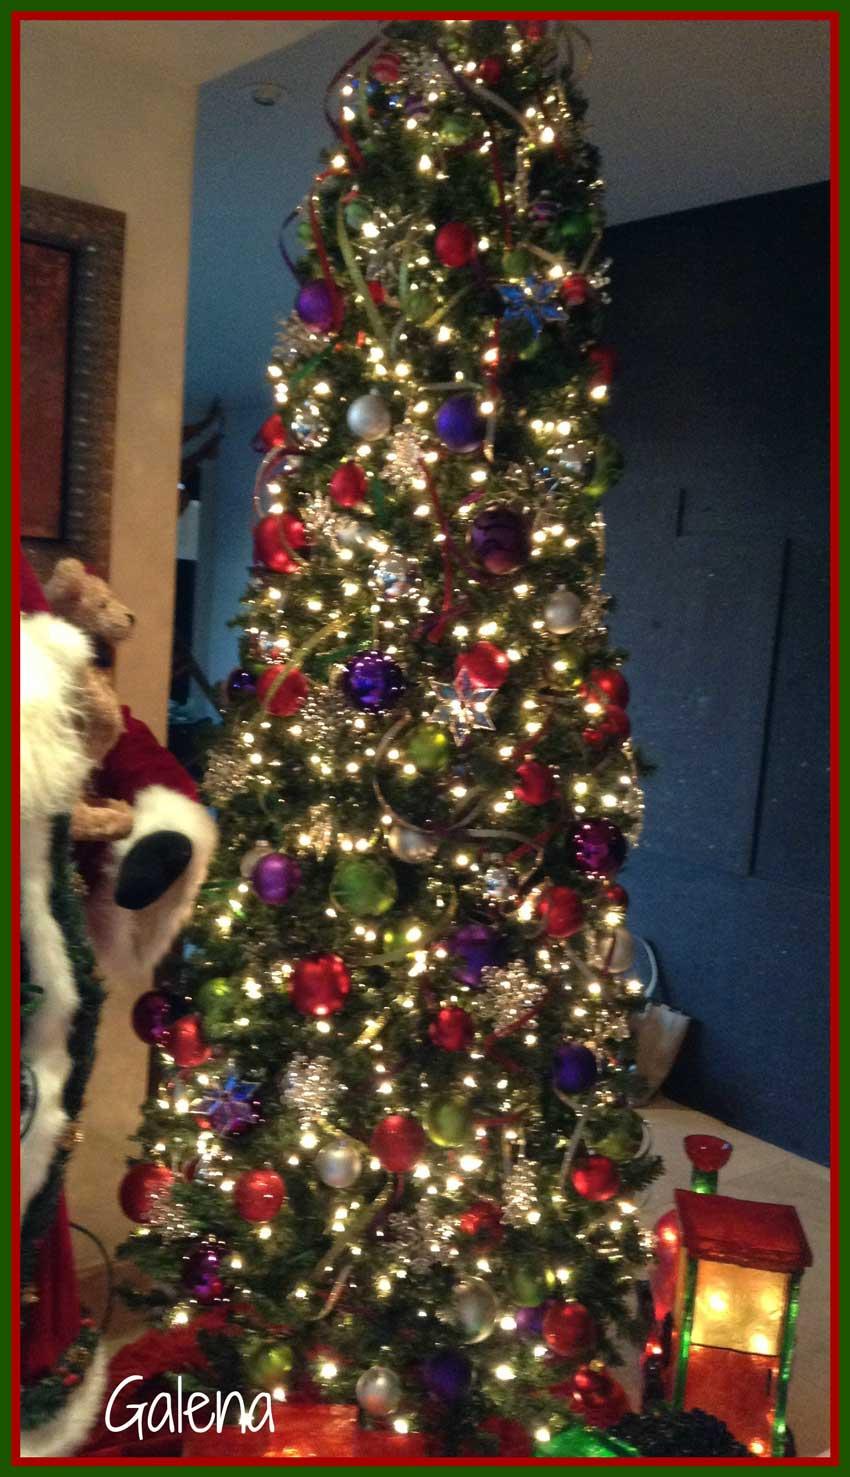 Navidad-Christmas-Decoracion-navideña-arbol-navideño-2